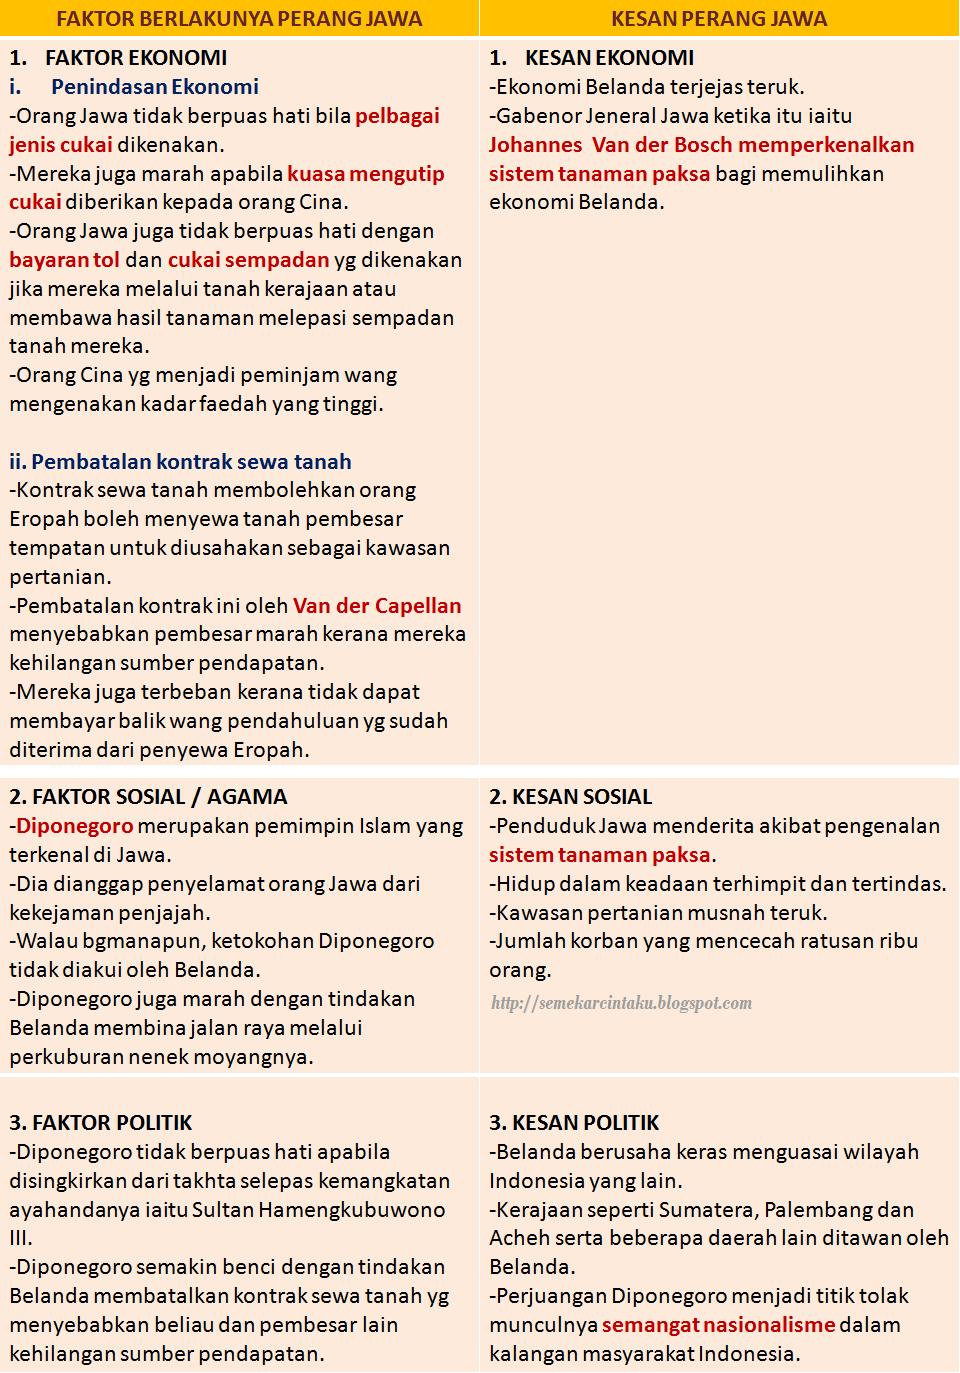 Blog Sejarah STPM Baharu: Semekar Cintaku : Perang Jawa